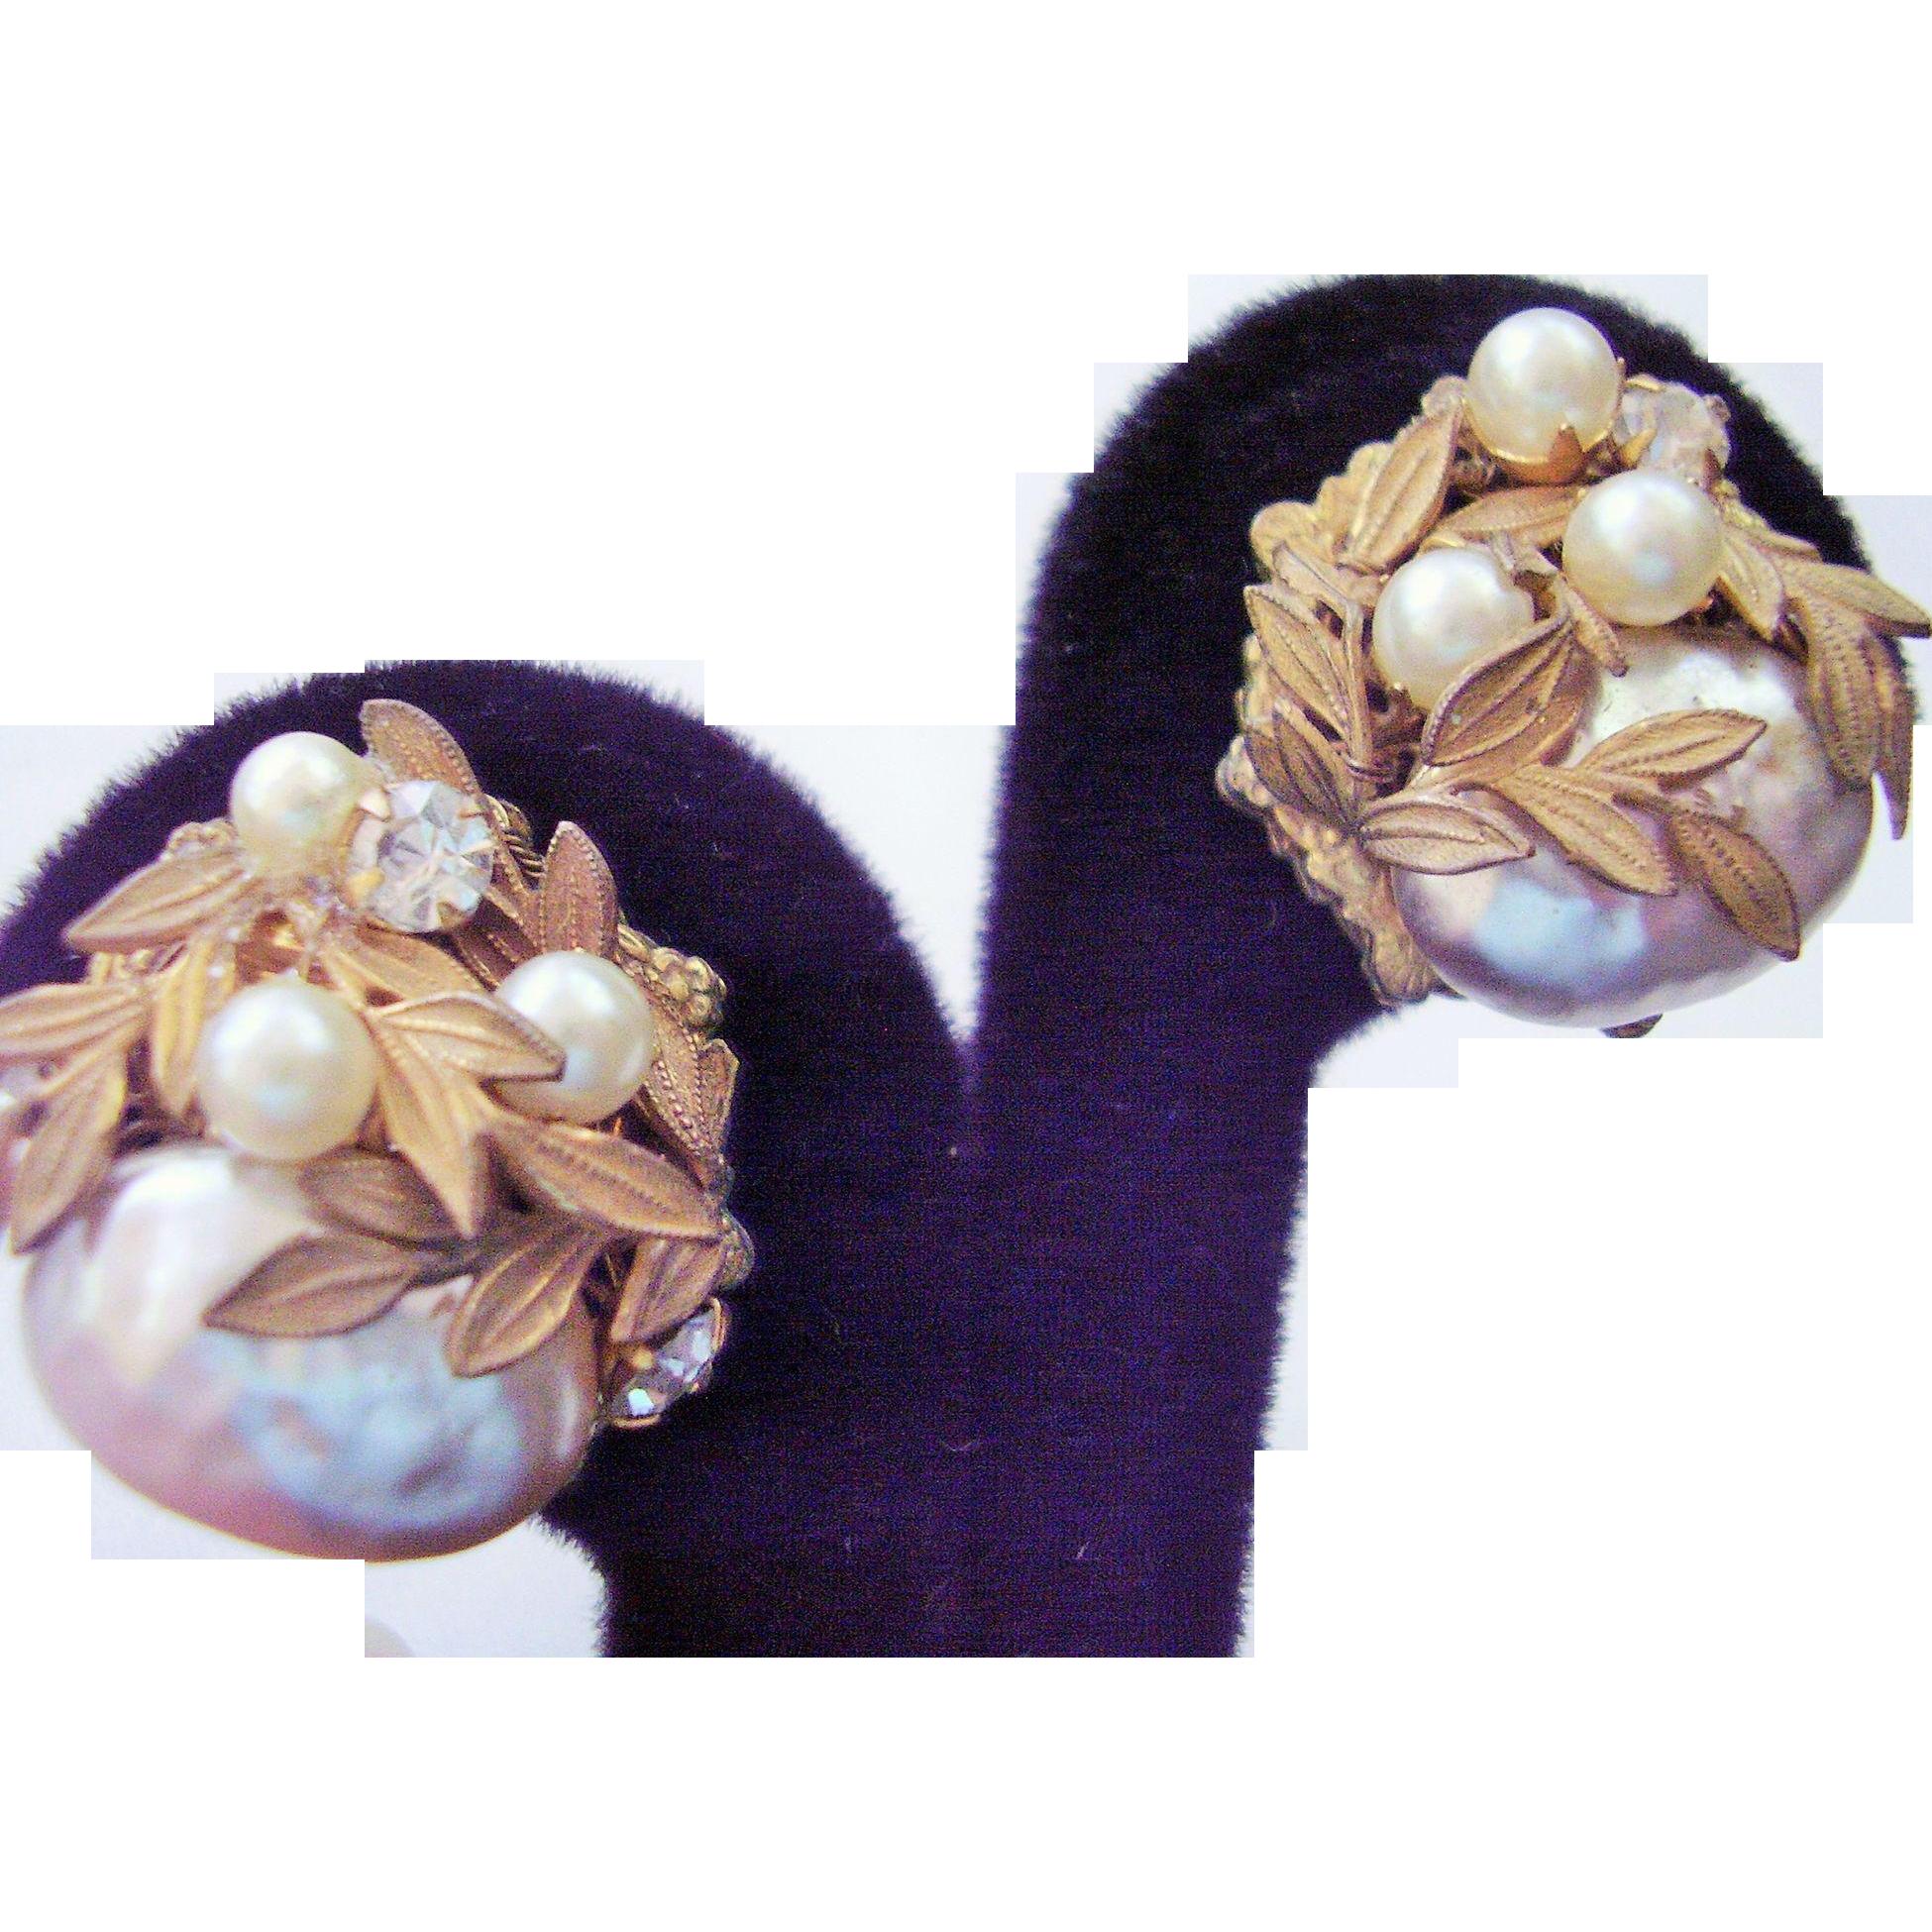 "Miriam Haskell Faux Baroque Pearl & Rhinestone Cluster Earrings - Vintage Clip Earrings 7/8""- Designer Signed"